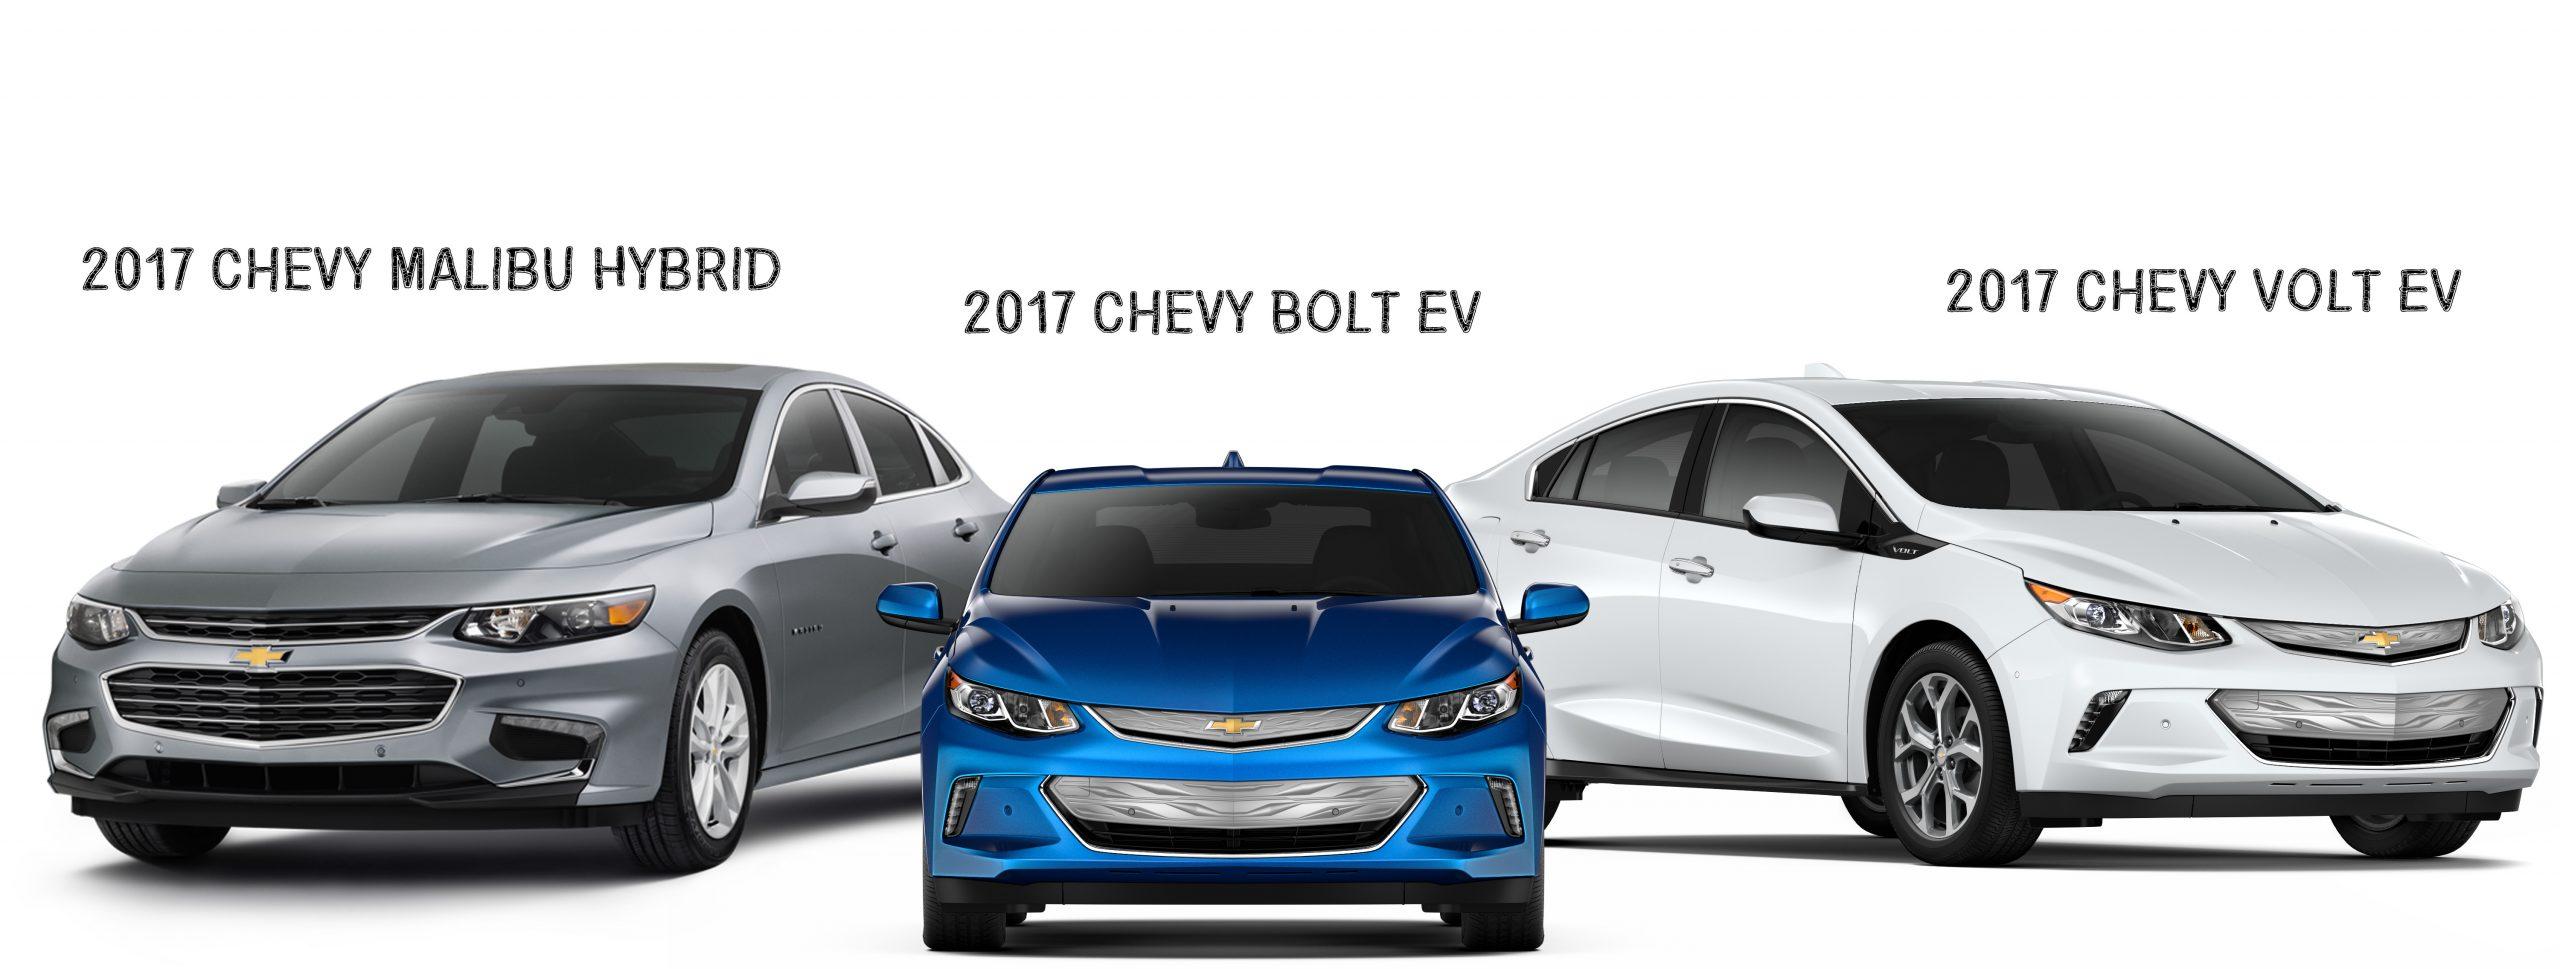 Miami Lakes Chevy 2017 PHEV EV Hybrid